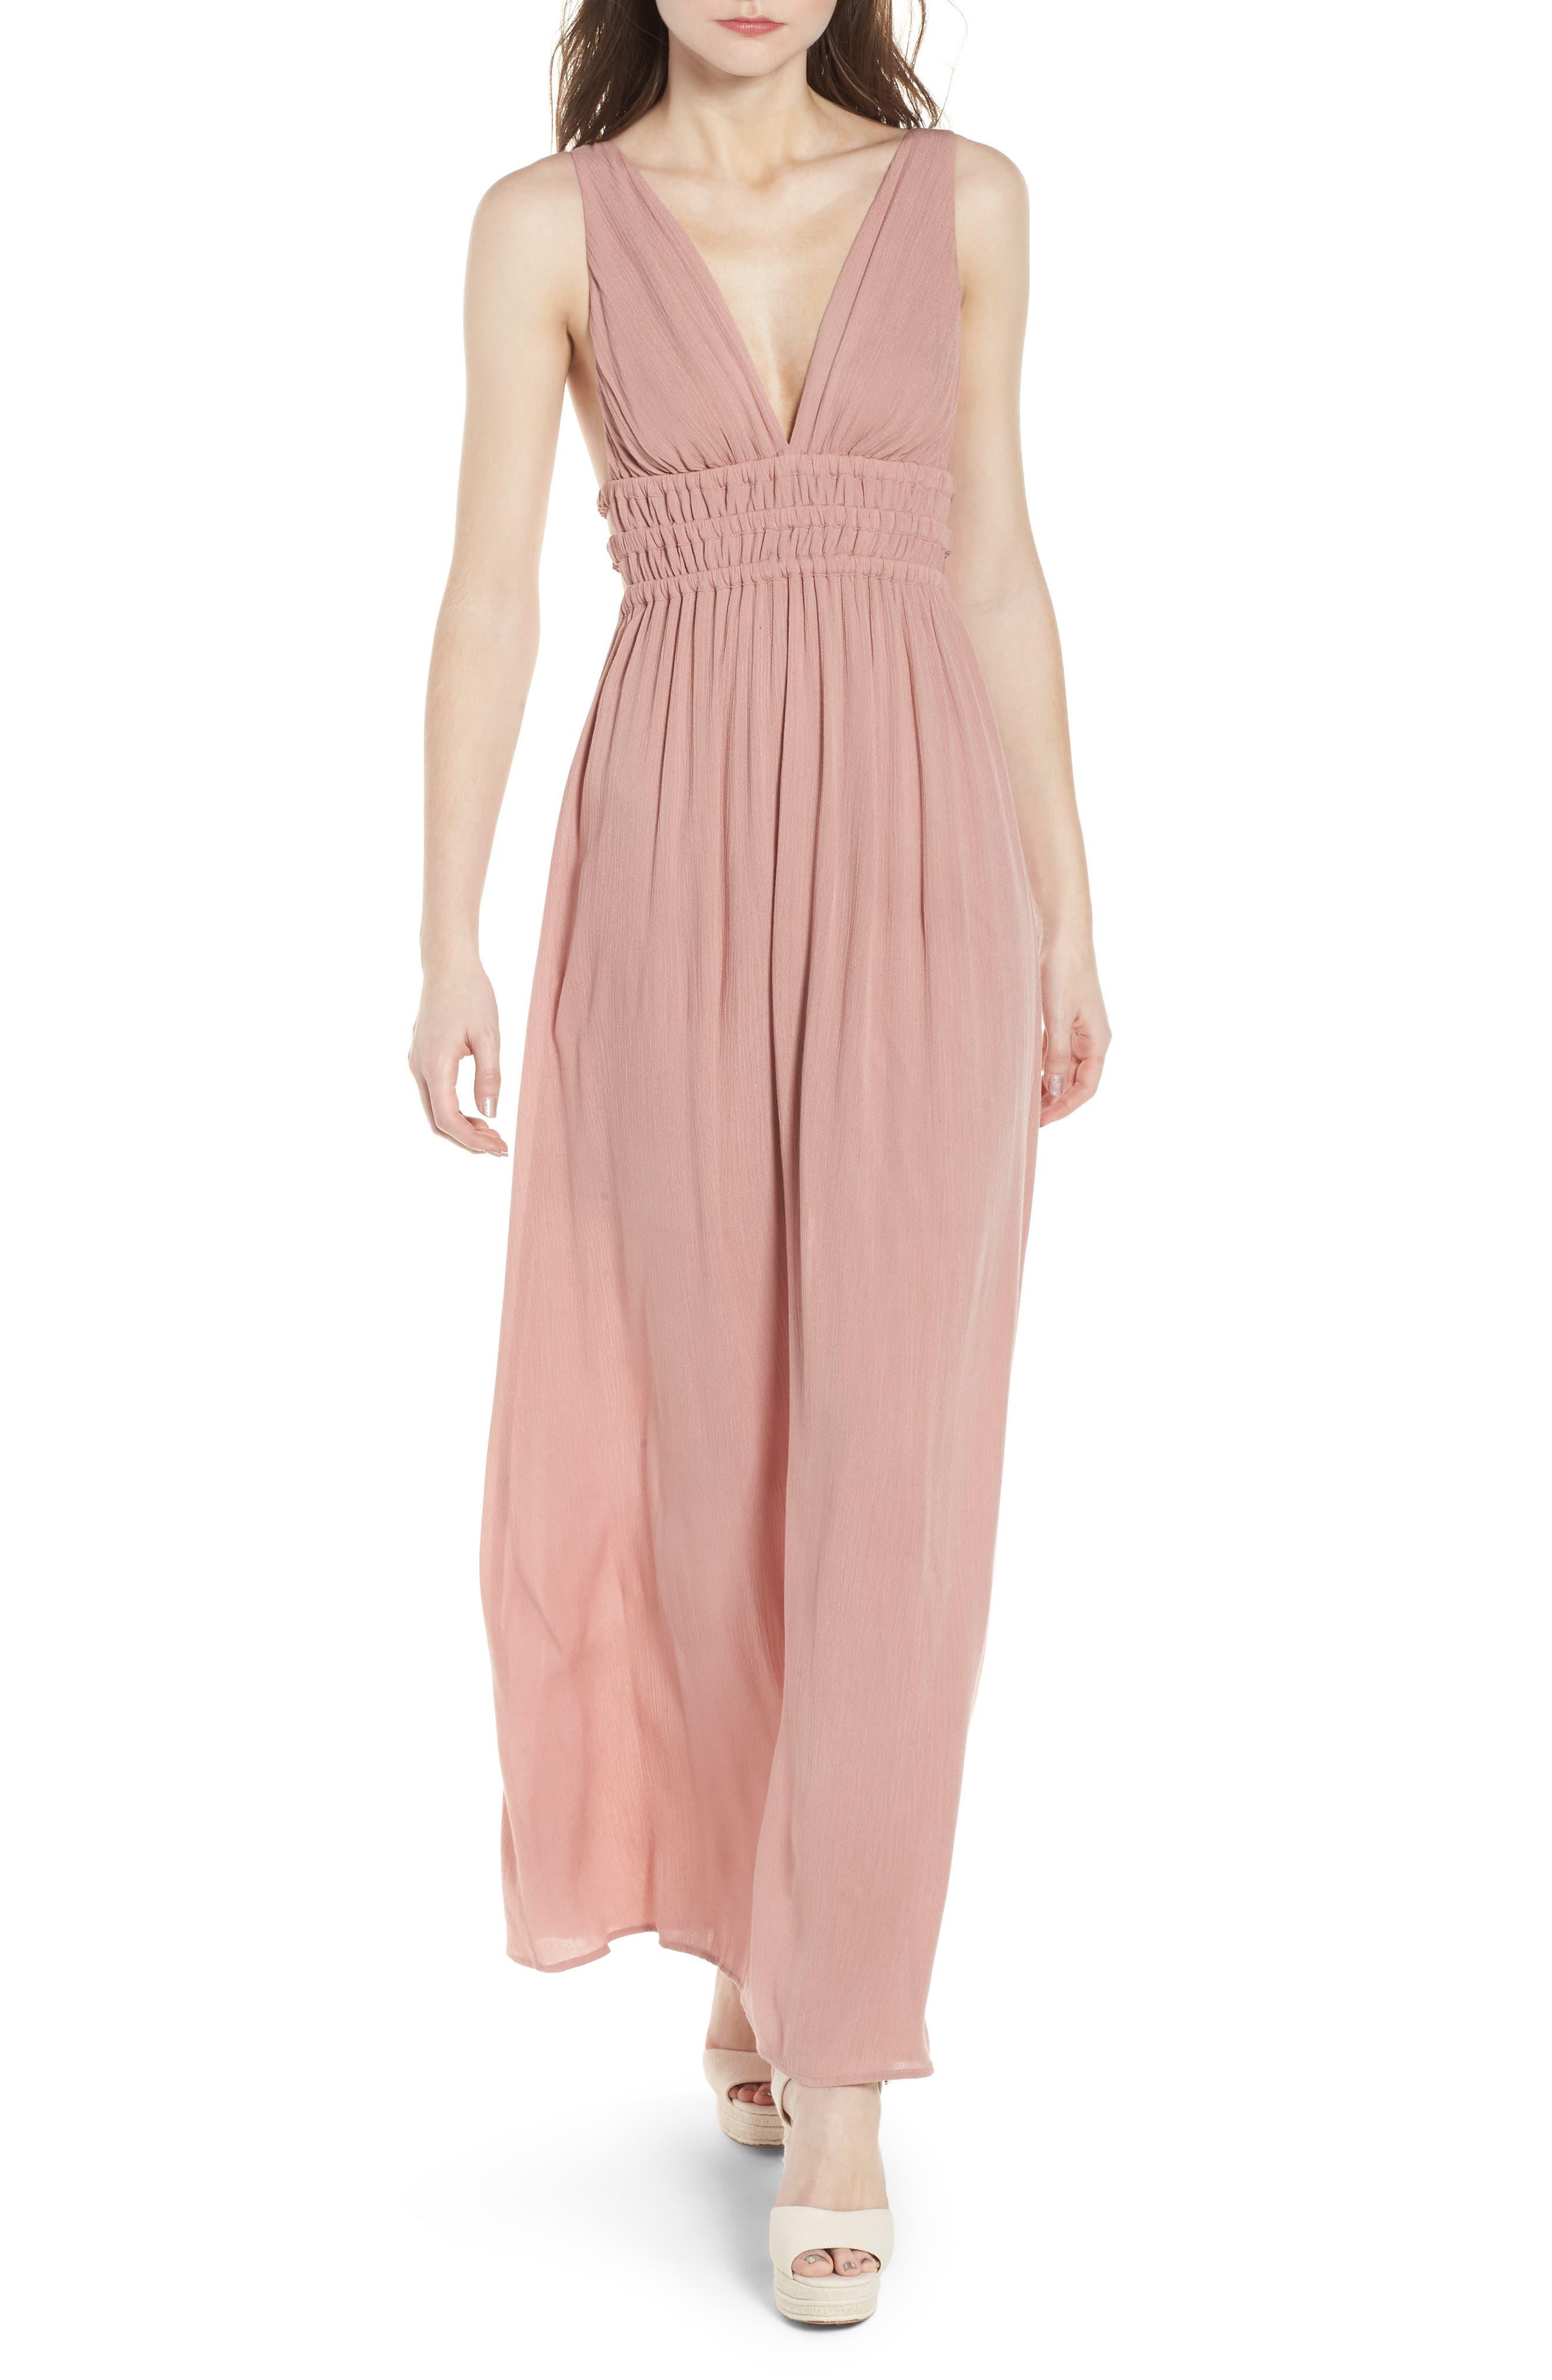 Surrey Maxi Dress,                         Main,                         color, Nude Rose